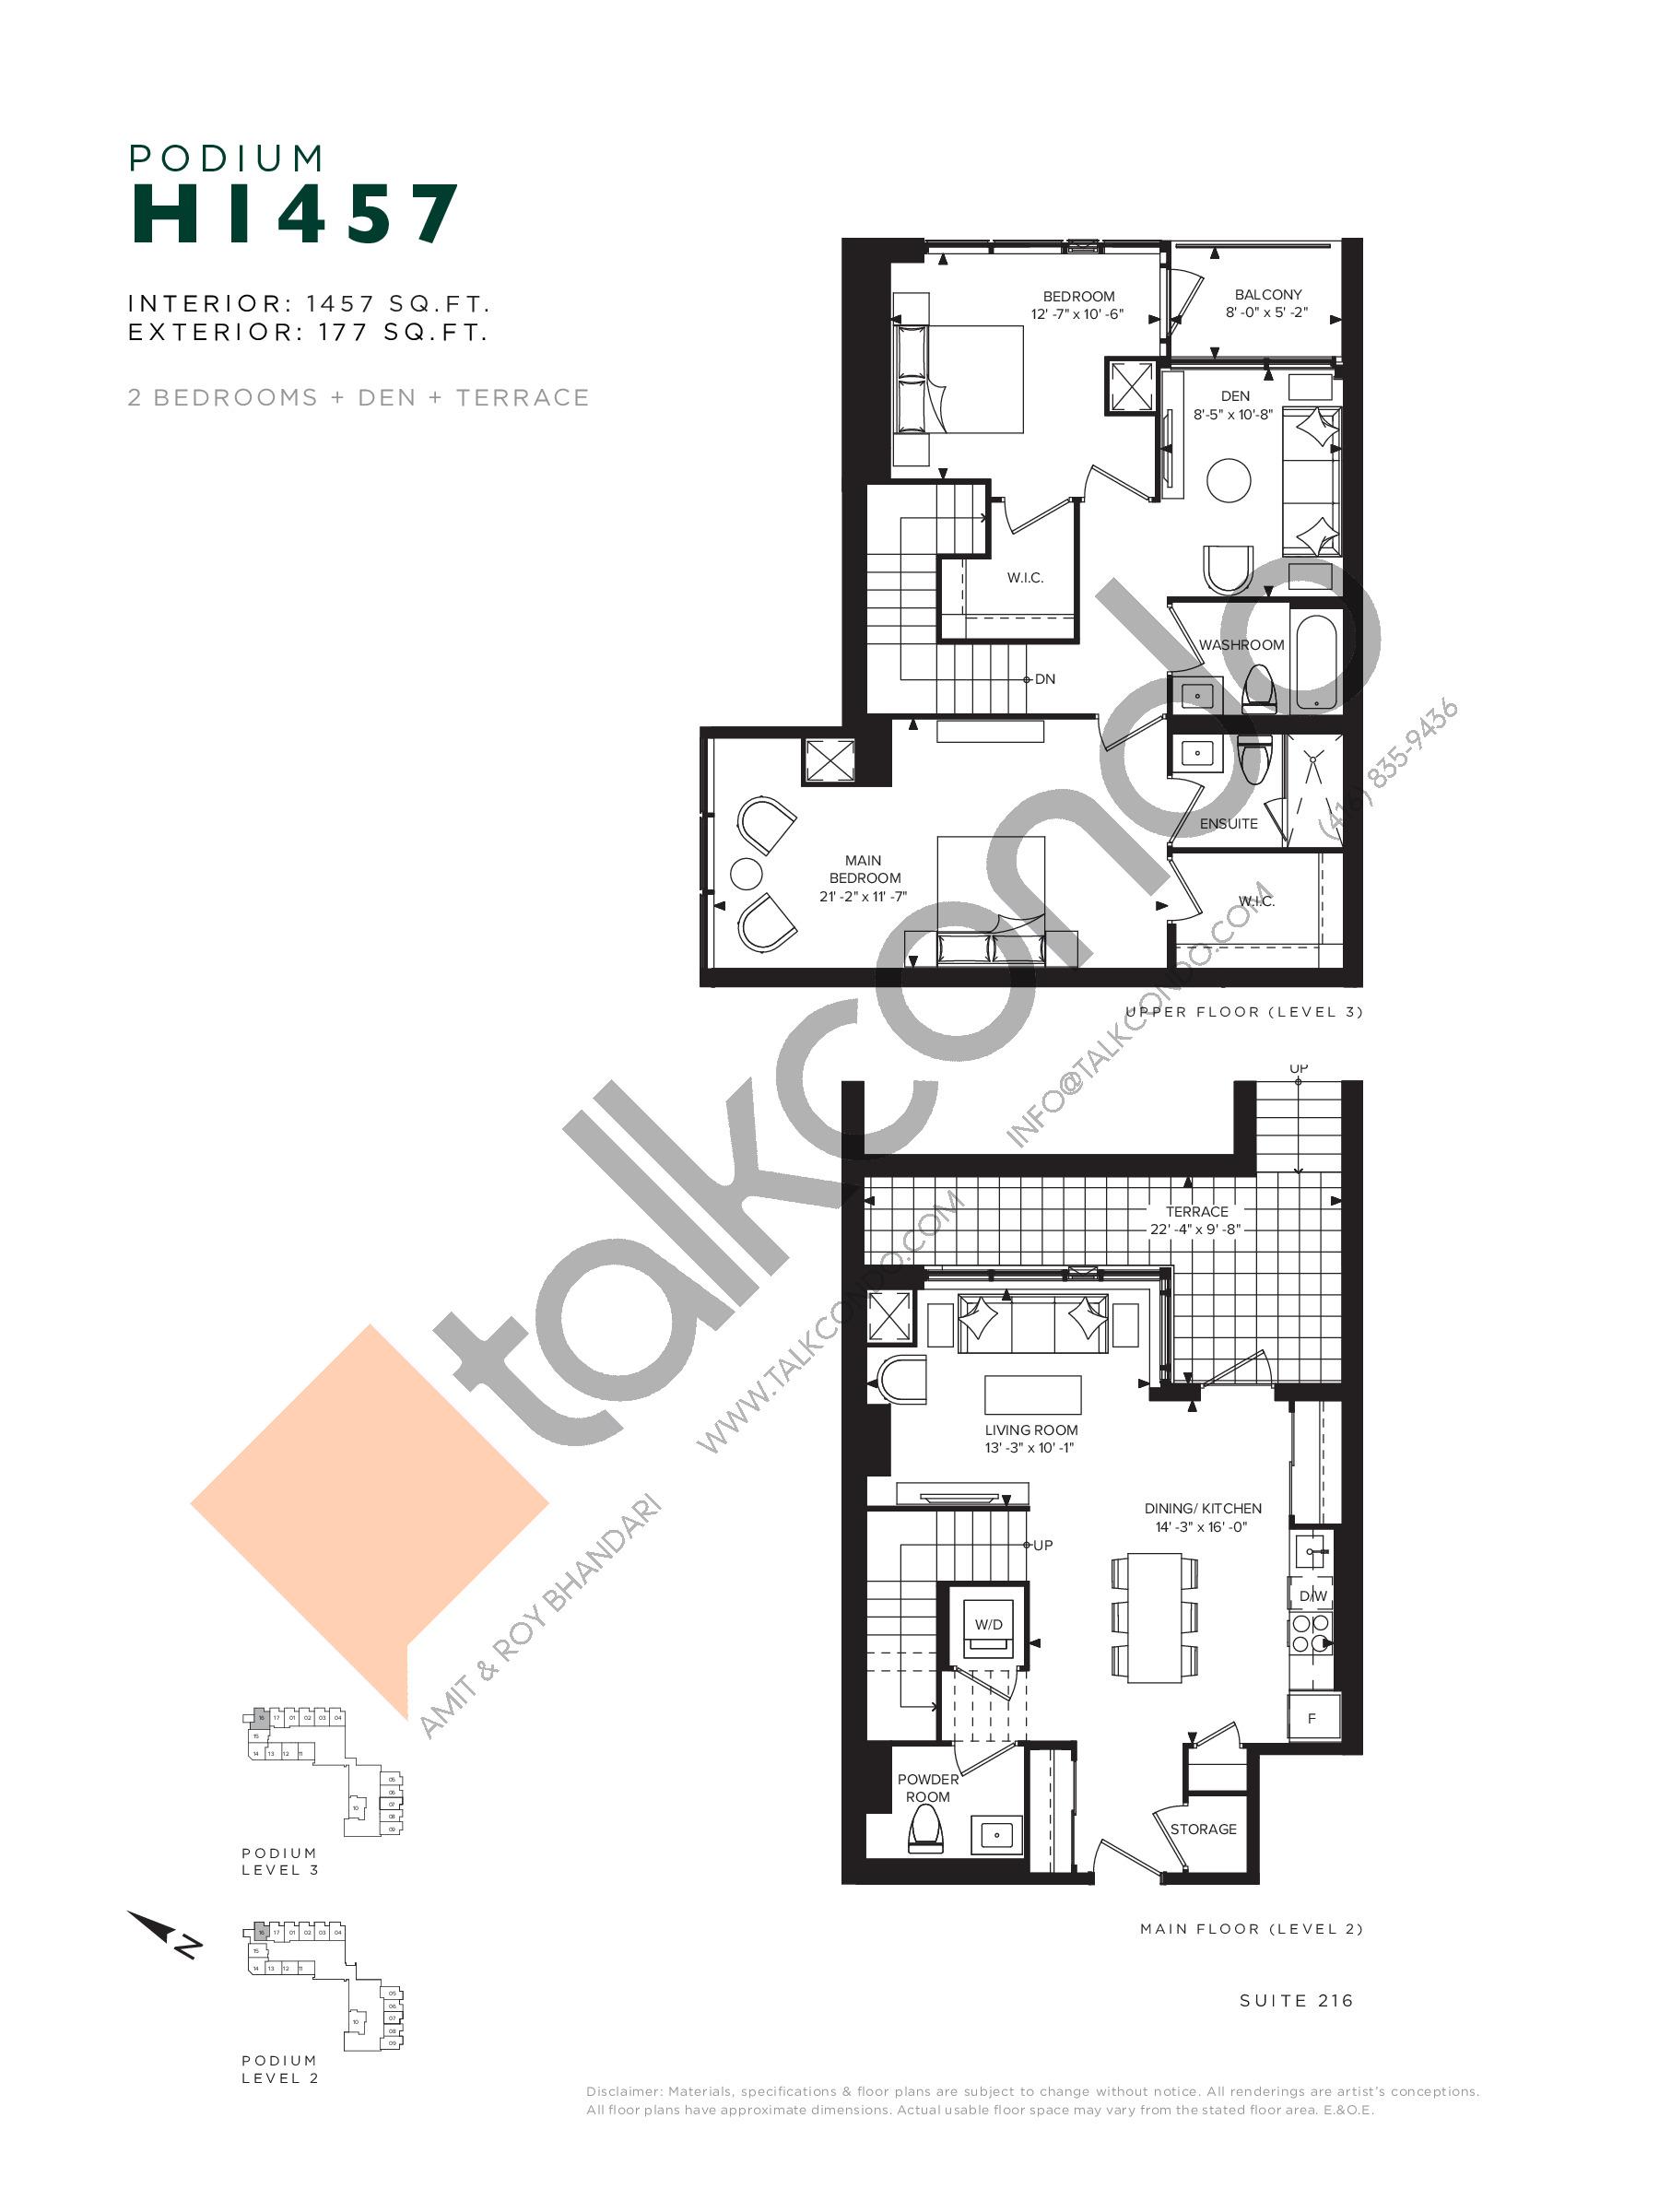 H1457 (Podium) Floor Plan at Hillmont at SXSW Condos - 1457 sq.ft